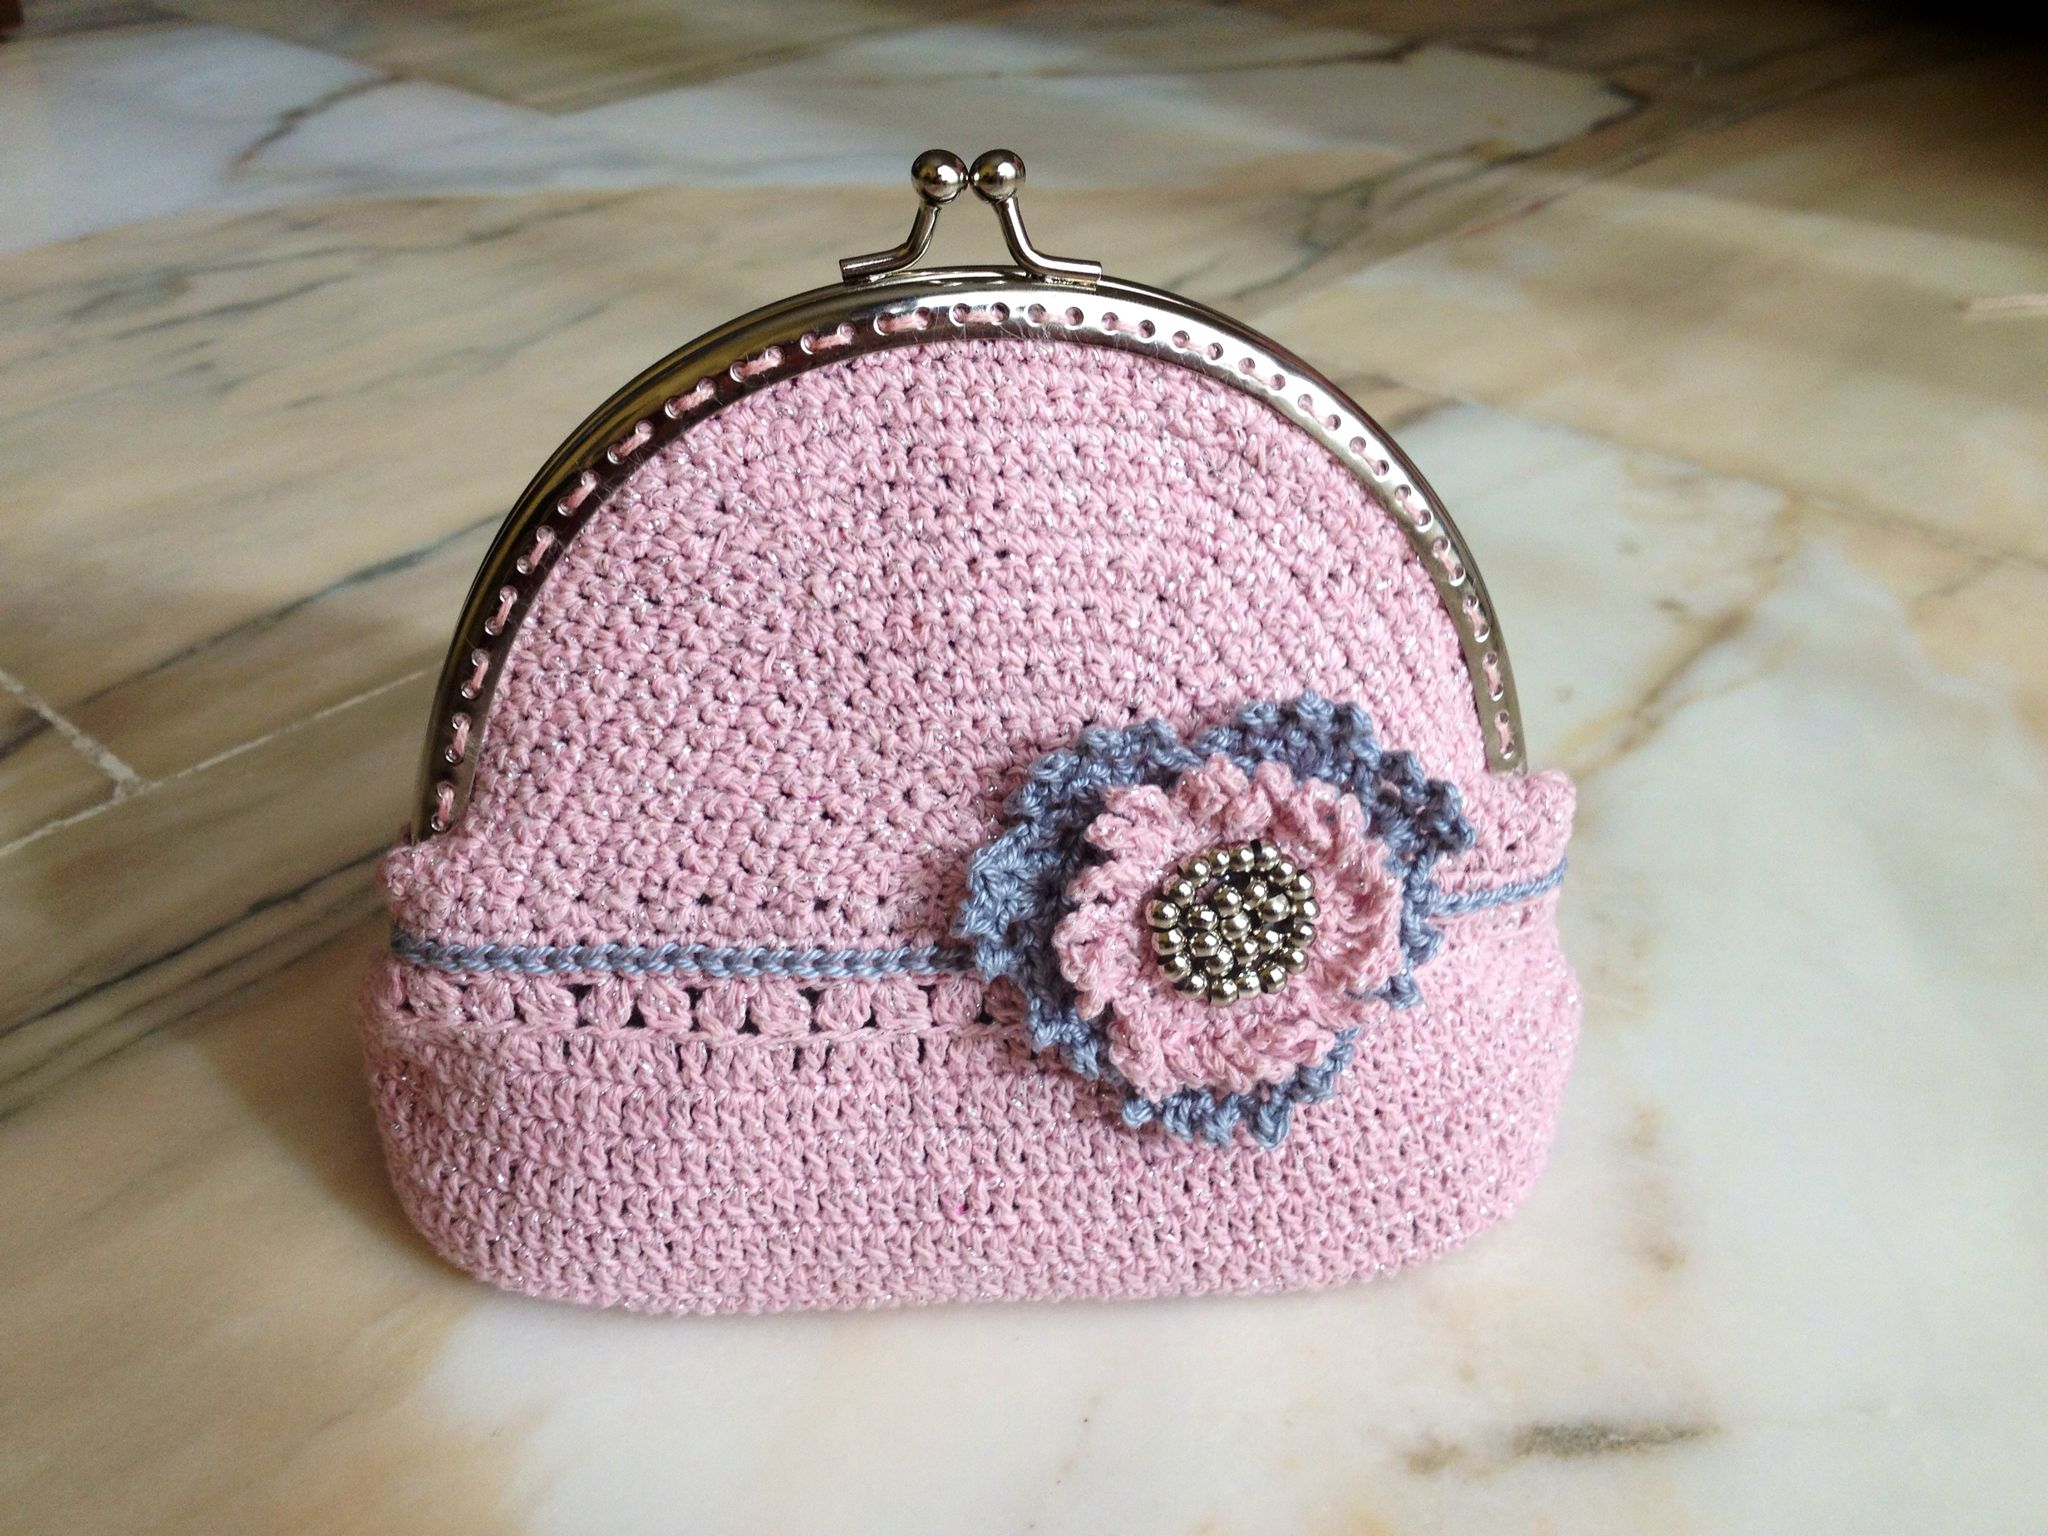 Asombroso Los Patrones De Crochet Libre Redondas Cresta - Ideas de ...